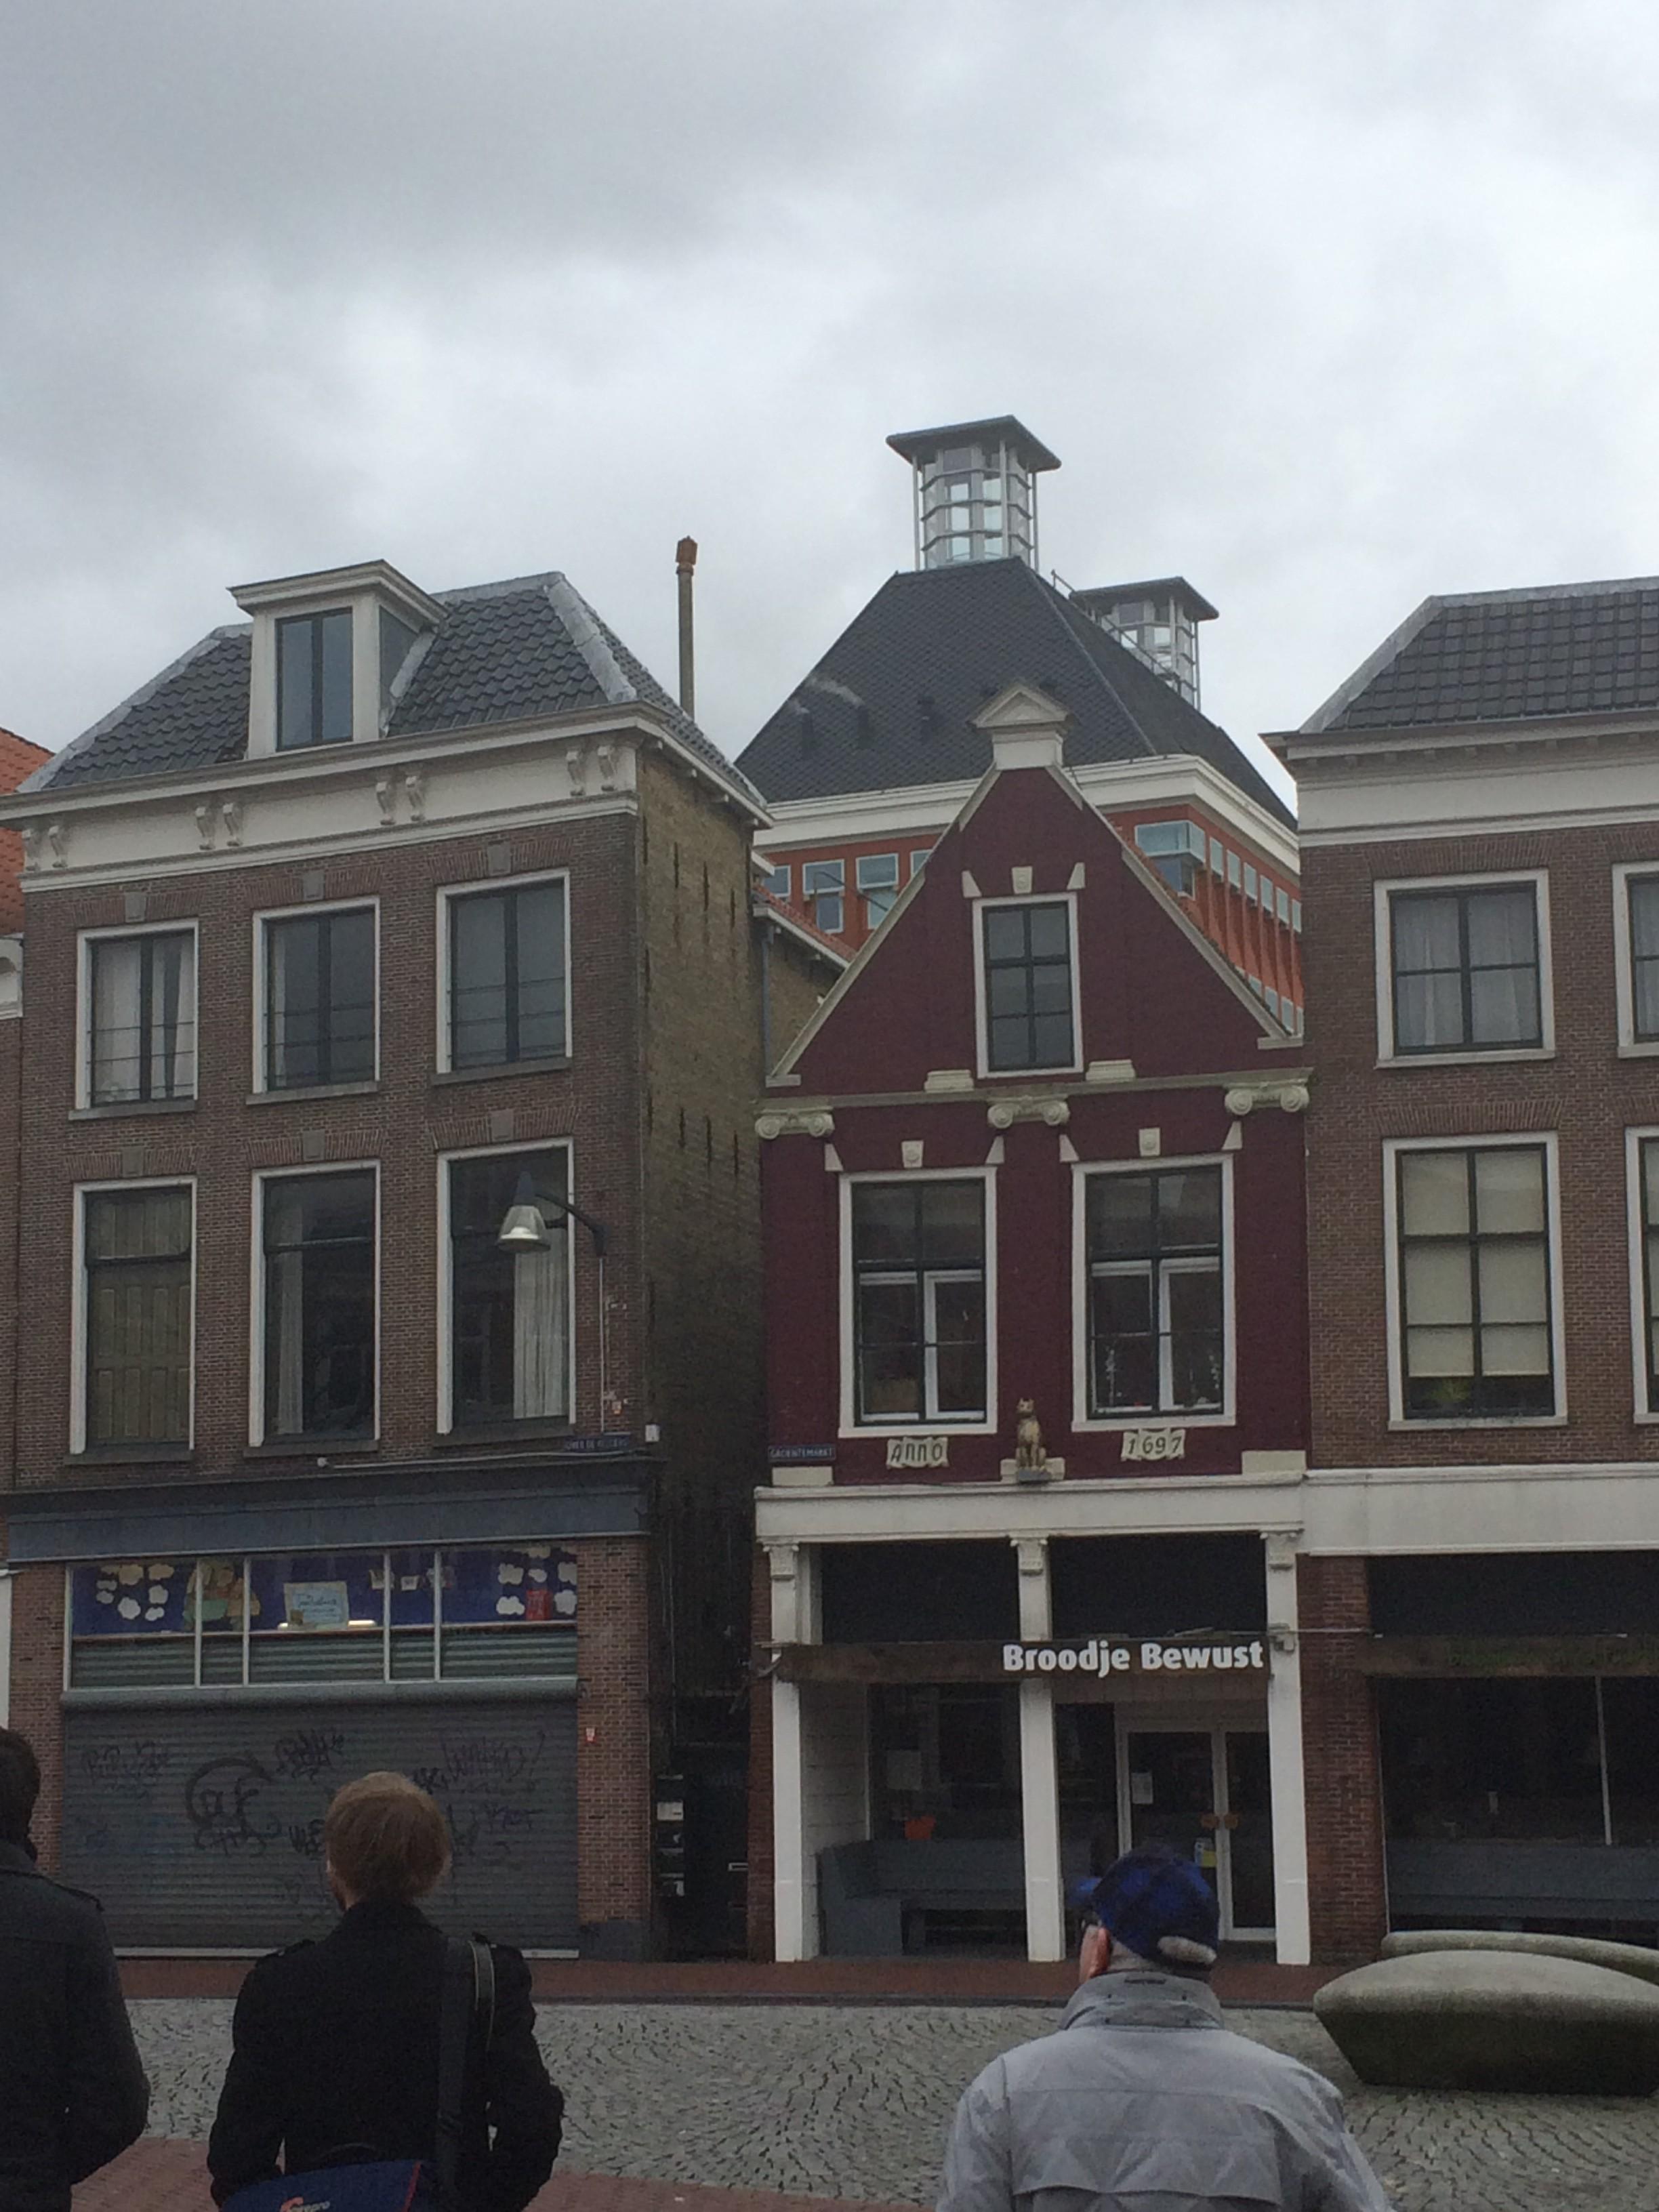 Leeuwarden avec l'hotel de la province Frise en arrière-plan